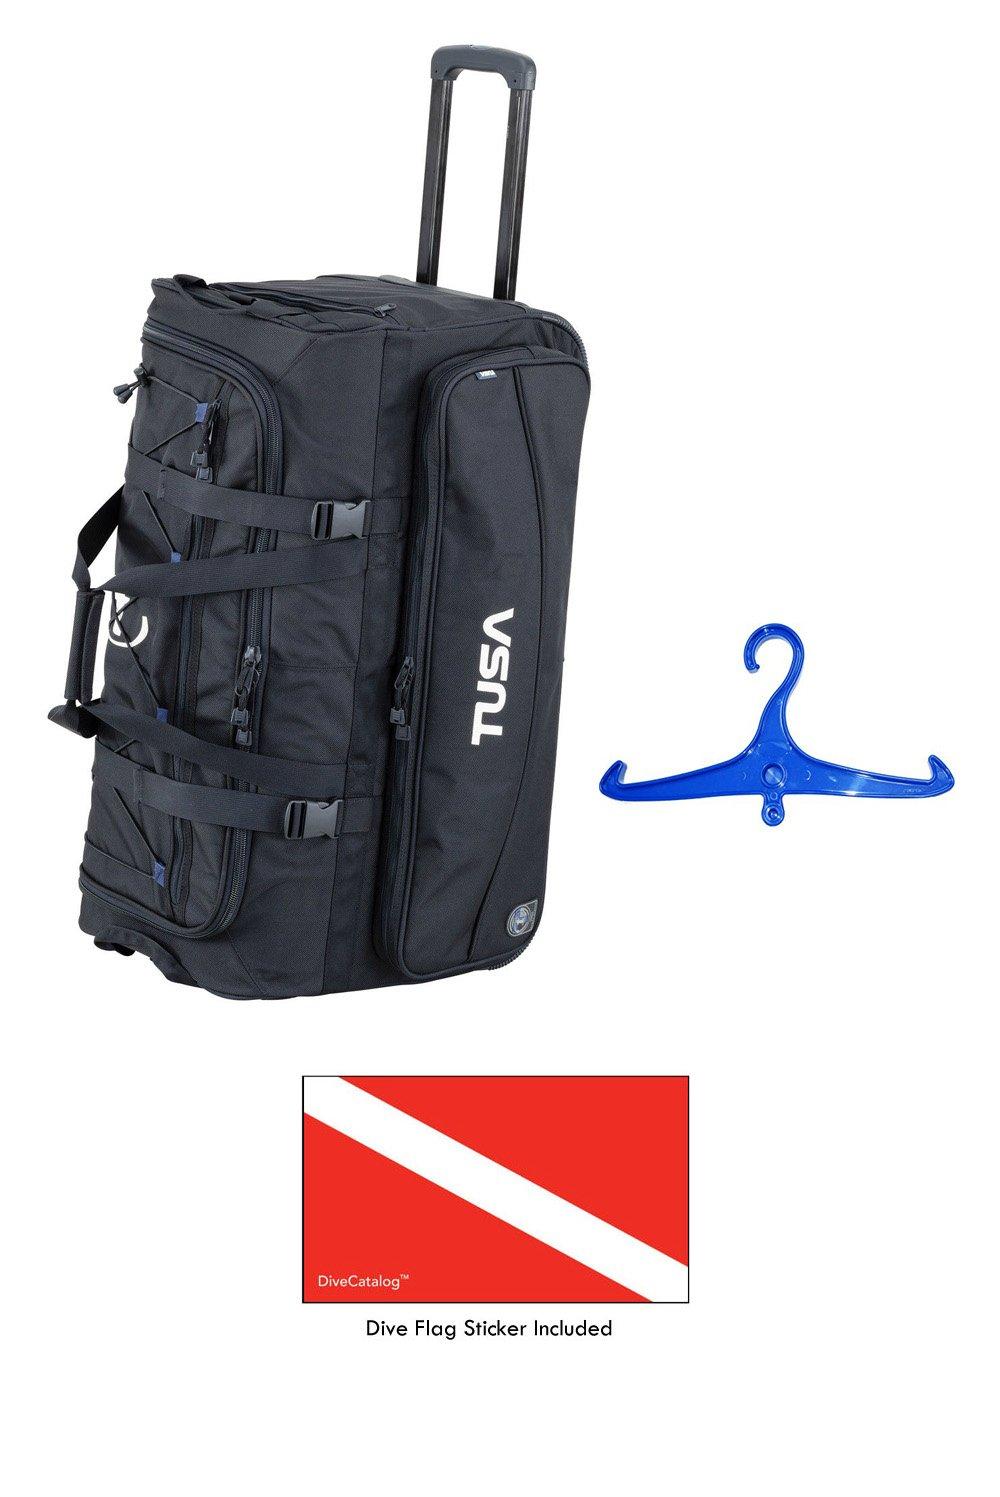 Tusa Dive Gear Roller Duffle Bag in Black w/DiveCatalog's Sticker & Blue BCD and Regulator Hanger